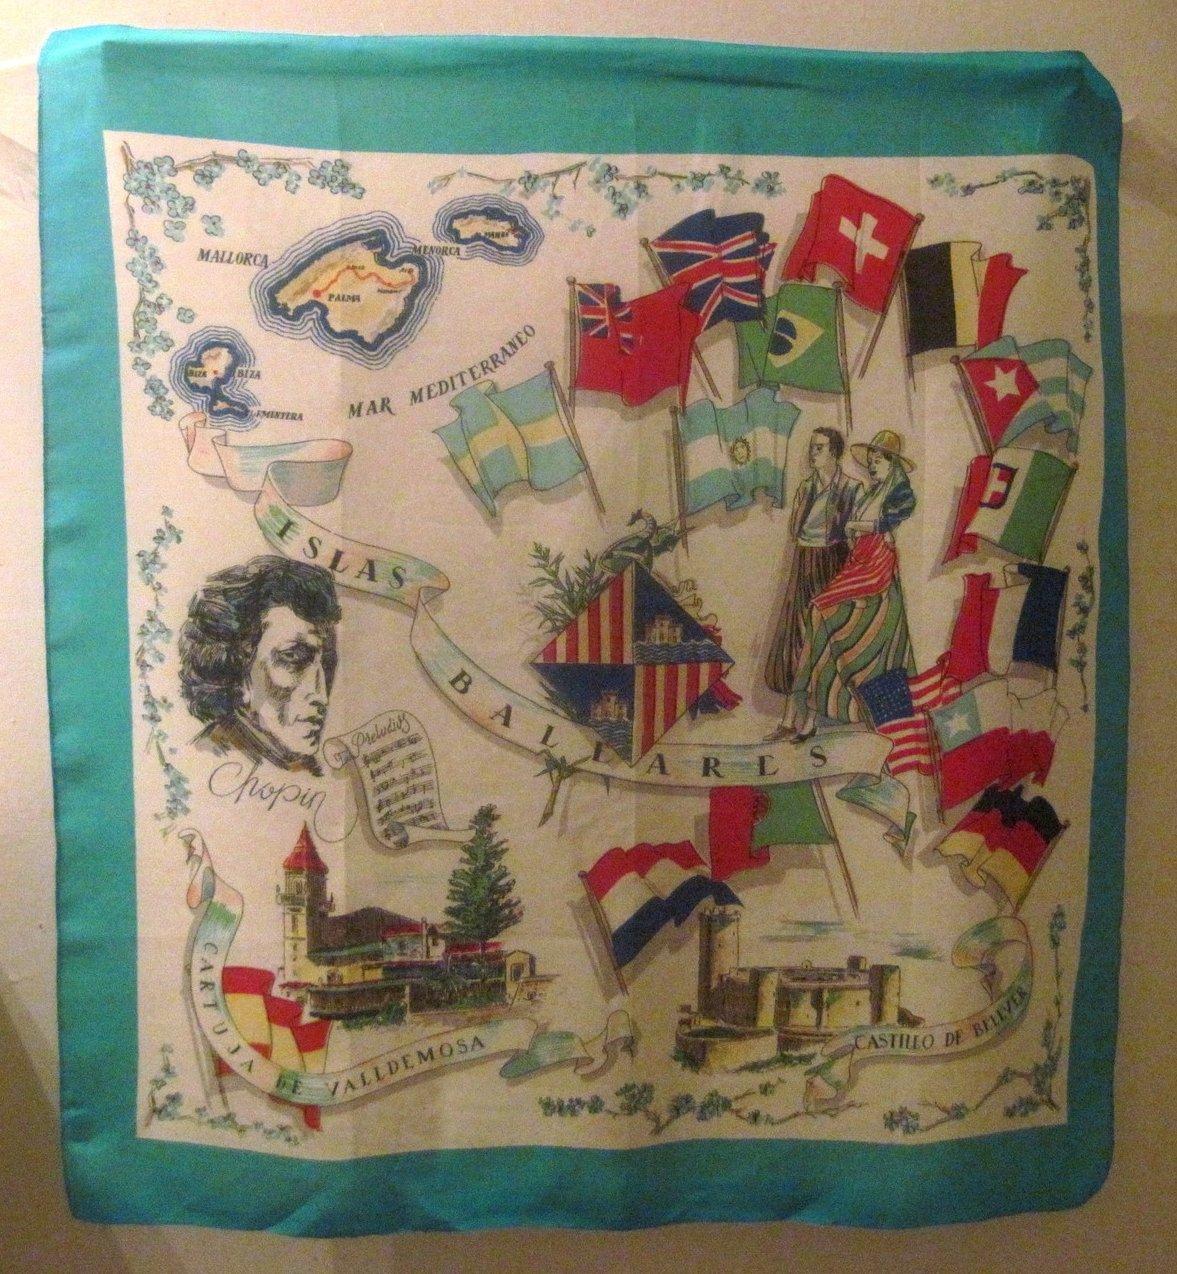 Mediterranean Balearic Islands Print Turquoise Scarf 29 X 31